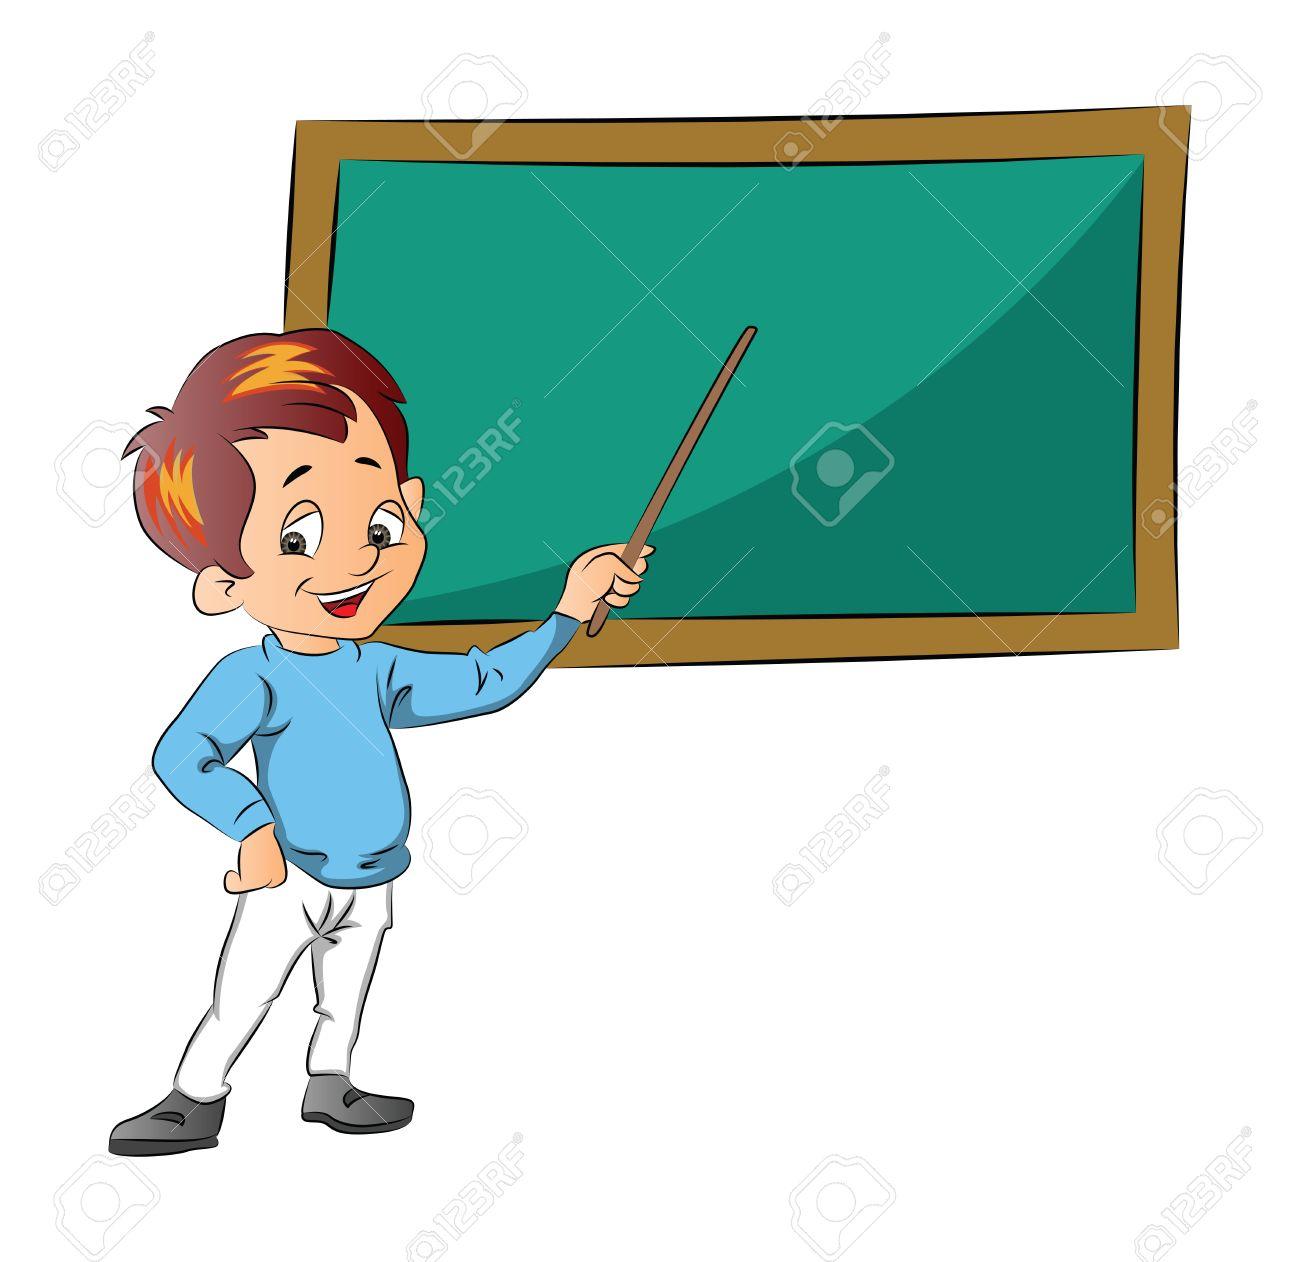 Boy Teaching, Vector Illustration Royalty Free Cliparts, Vectors ...